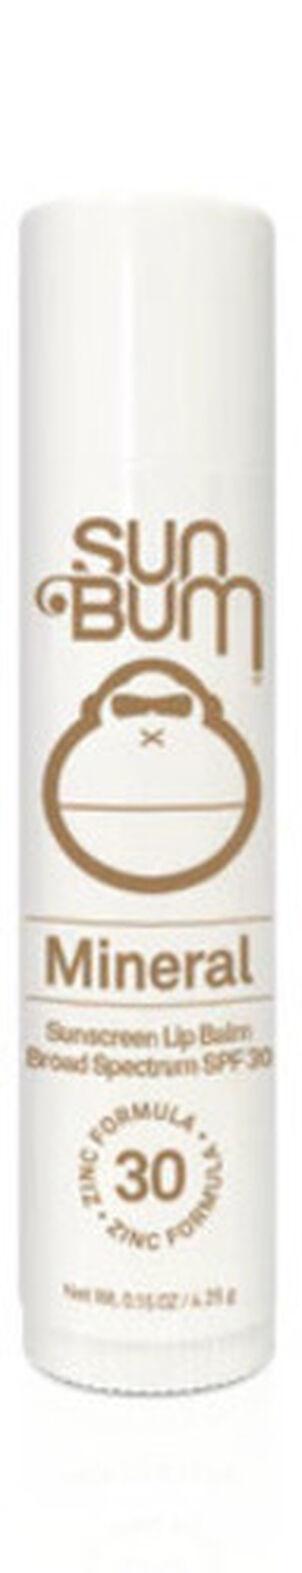 Sun Bum Mineral Lip Balm SPF 30, .15 oz